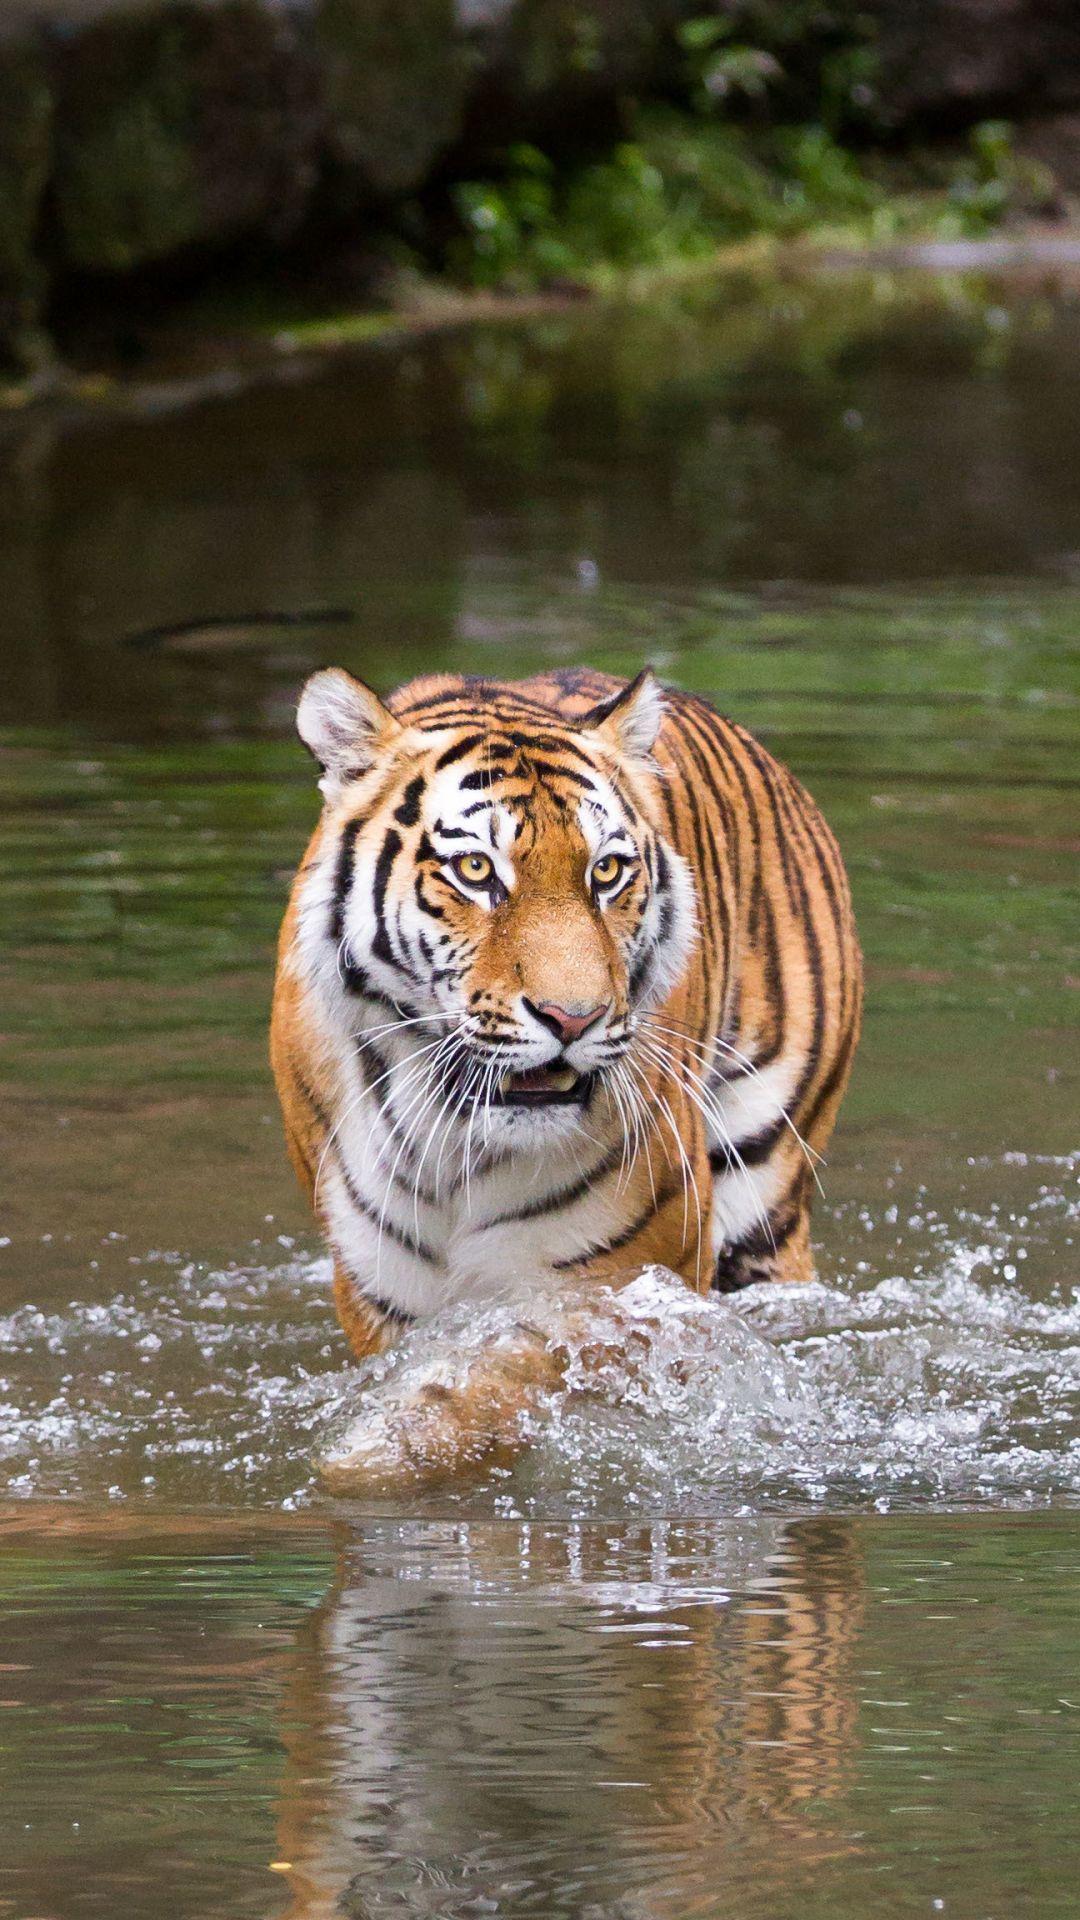 Tiger Wallpaper Ios Animals Wallpapers Ideas In 2020 Animals Wild Animals Beautiful Beautiful Cats